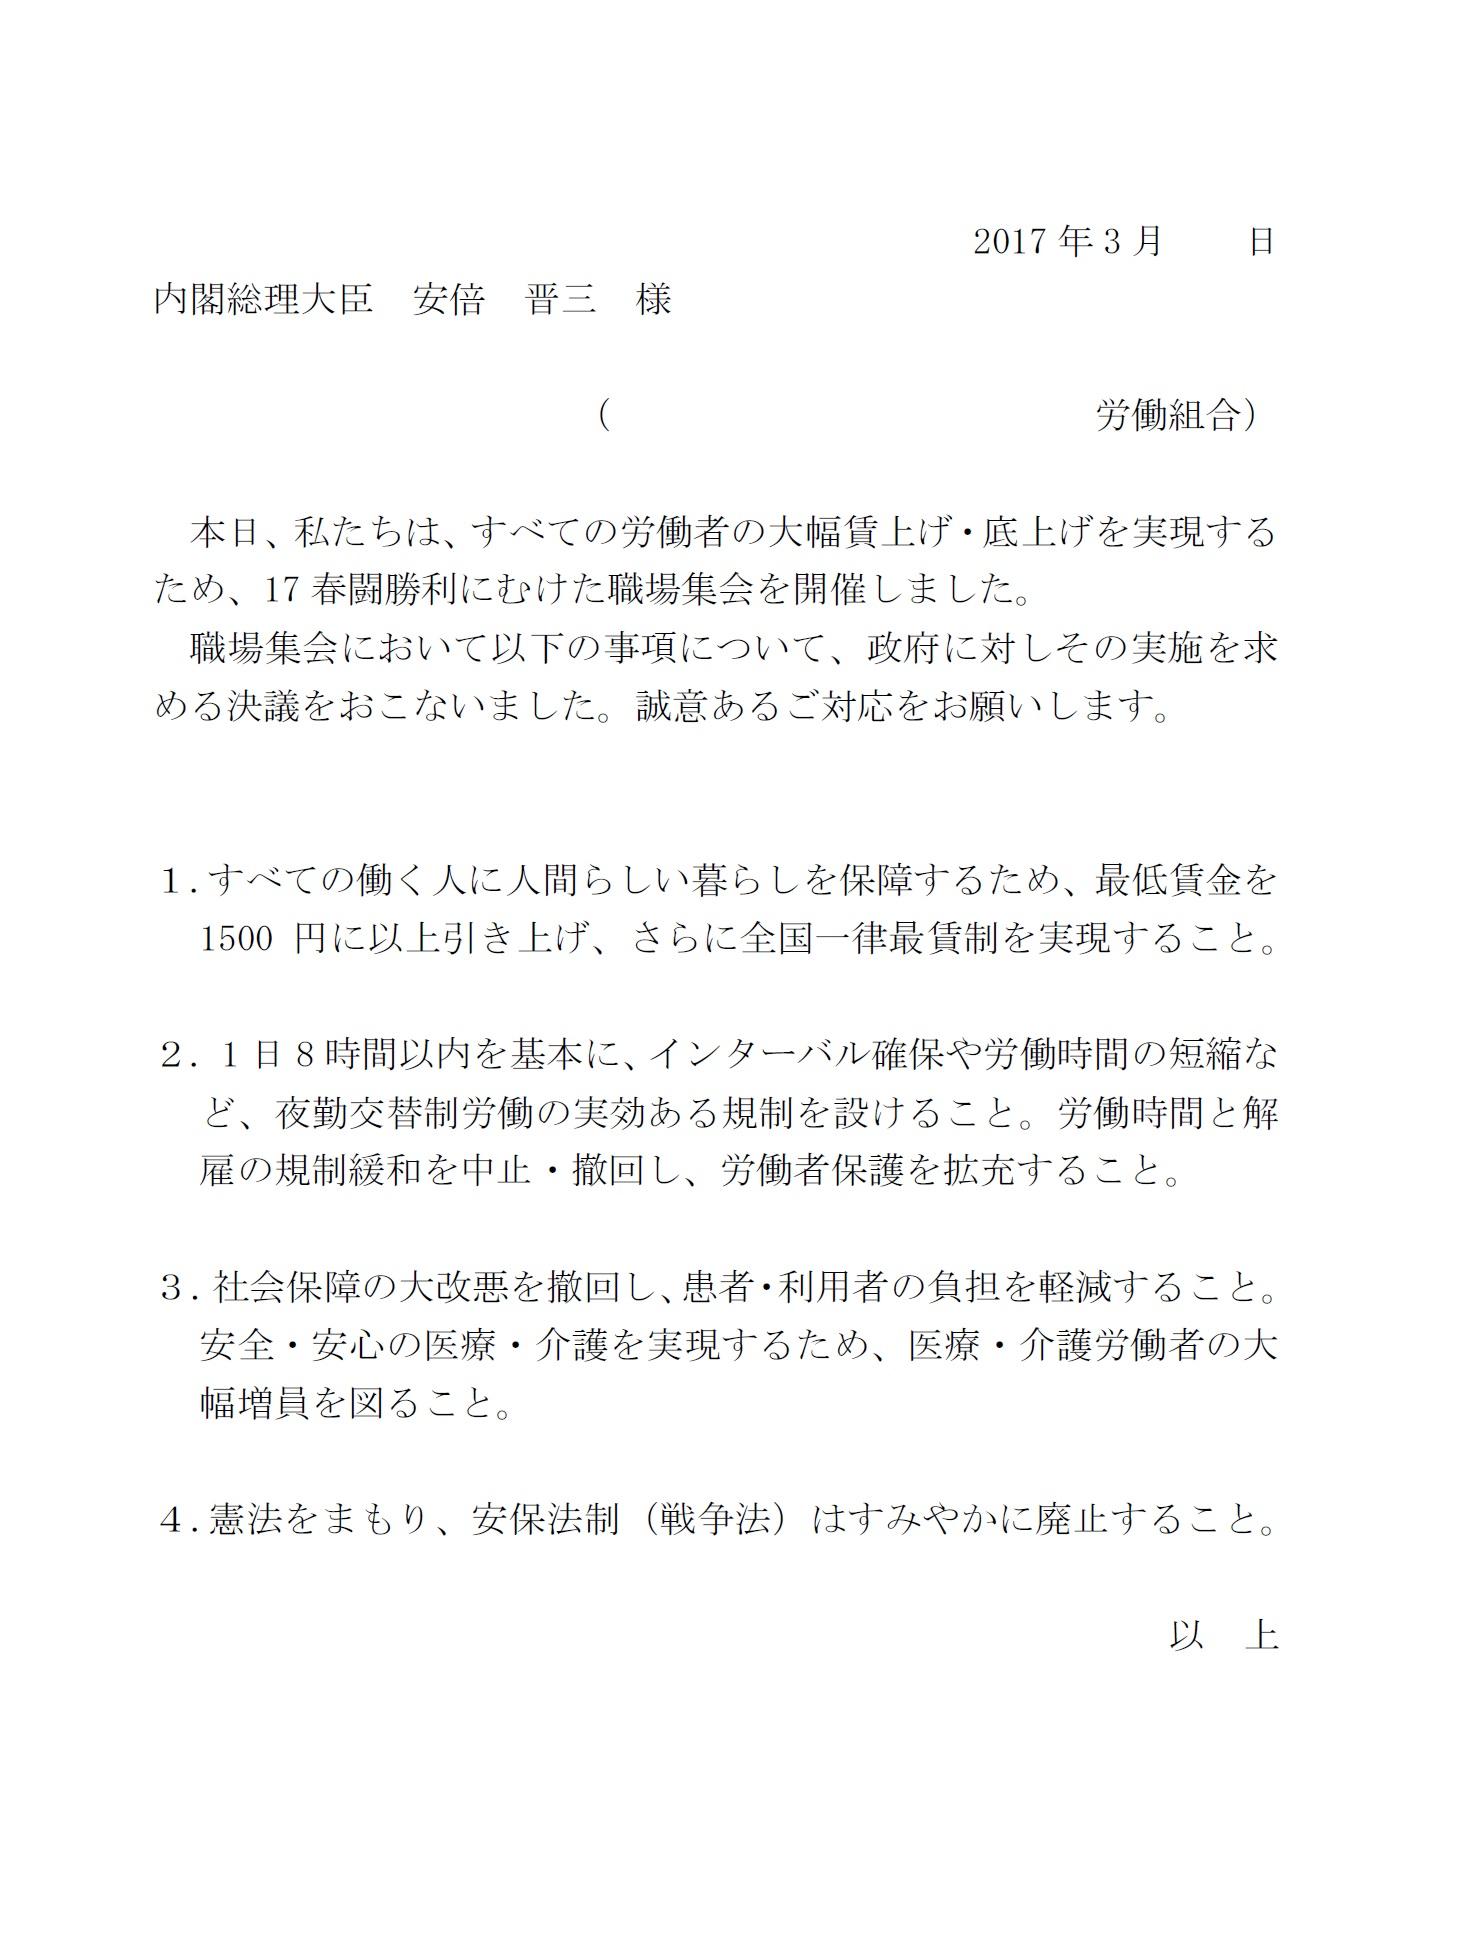 http://irouren.or.jp/news/17%E6%98%A5%E9%97%98FAX%E8%A6%81%E8%AB%8B.jpg